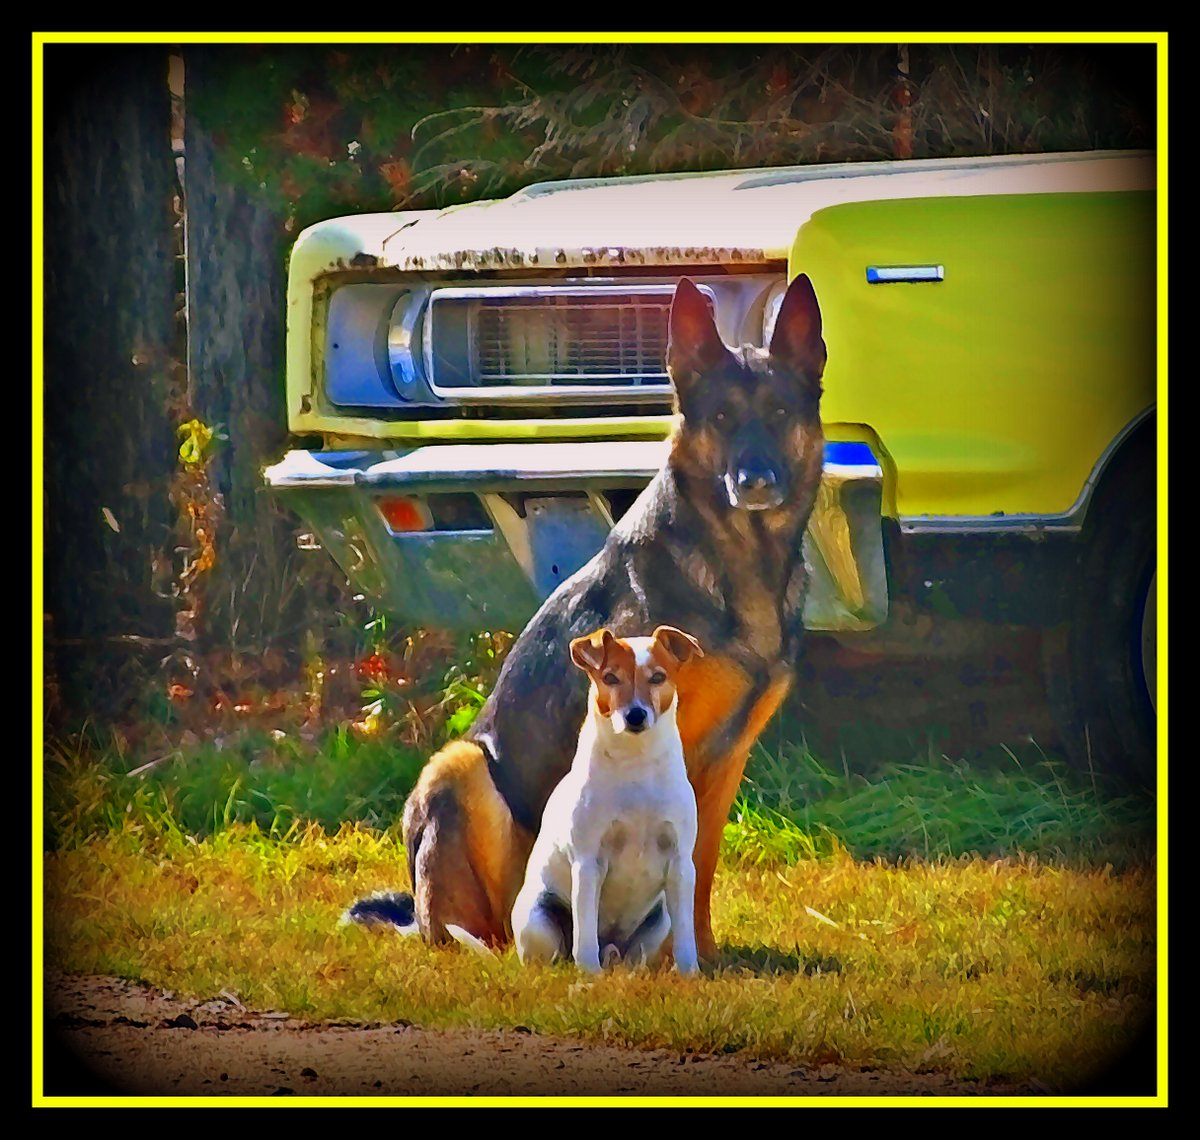 """Frankie Wanted a Portrait"" - Watercolor - along the Dawson Trail in La Coulee, Manitoba #doggos #dogs #DawsonTrail #DawsonRoad #LaCoulee #SteAnneRM #Manitoba #Southeast #Eastman #Fall2020 #Autumn2020  #October2020 #Watercolor #watercolorart #photoart #car #Rambler #Rebel #retro https://t.co/SrcllCVGtA"